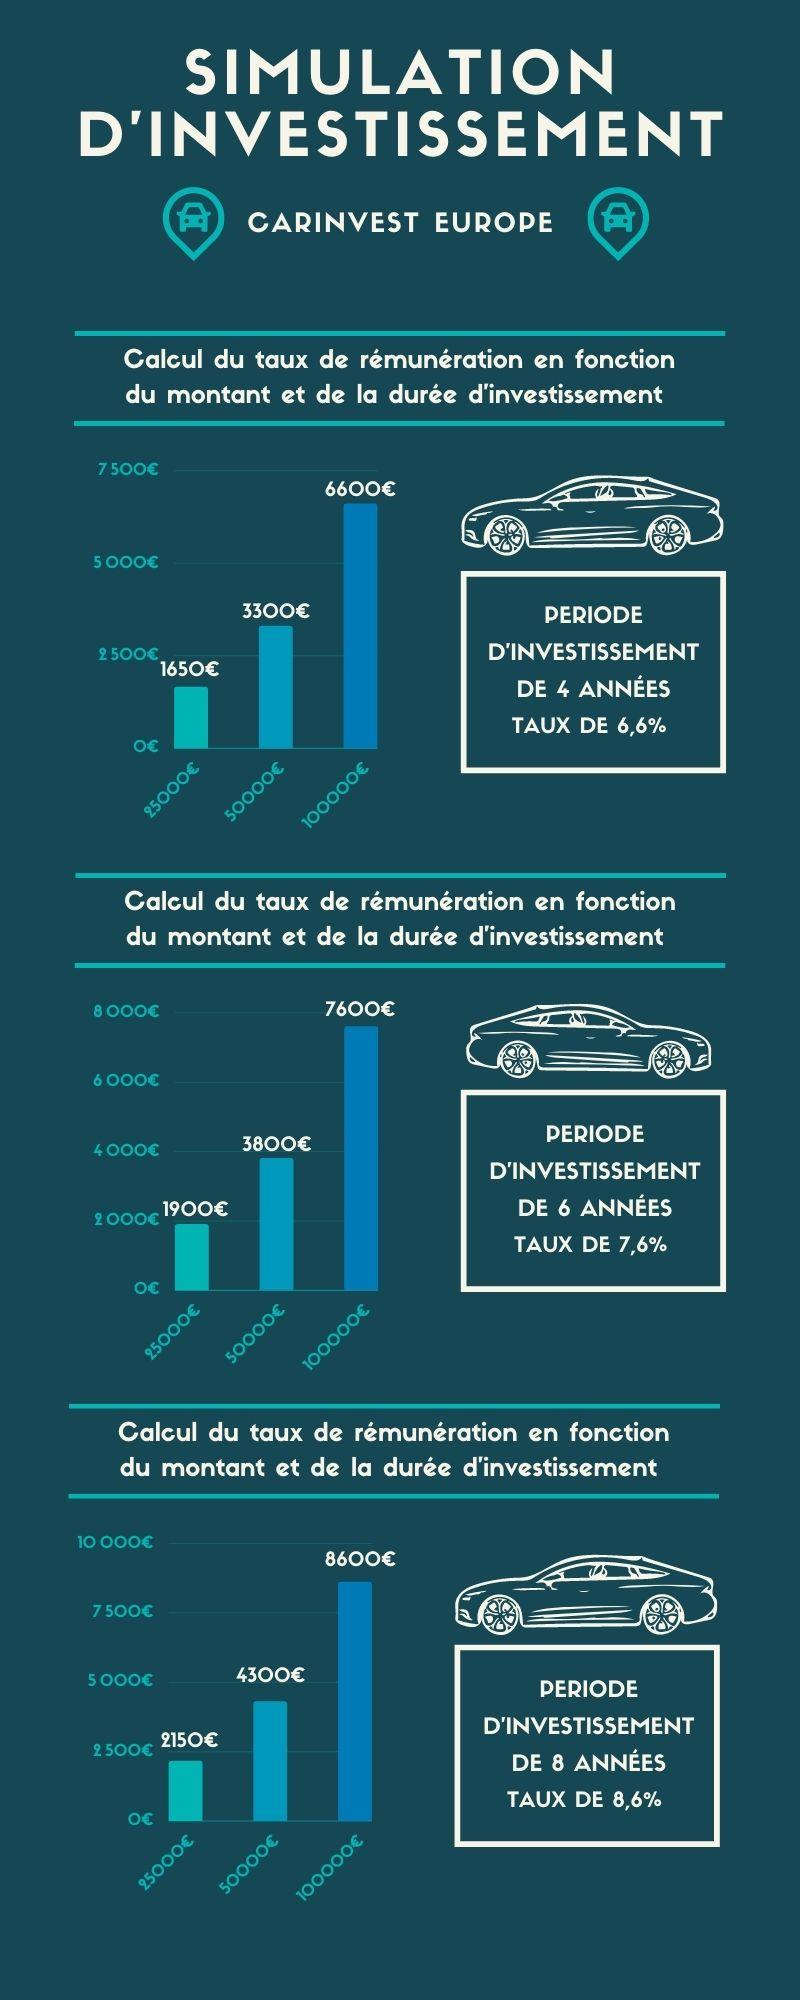 CAR INVEST Europe infographie rentabilité investissement